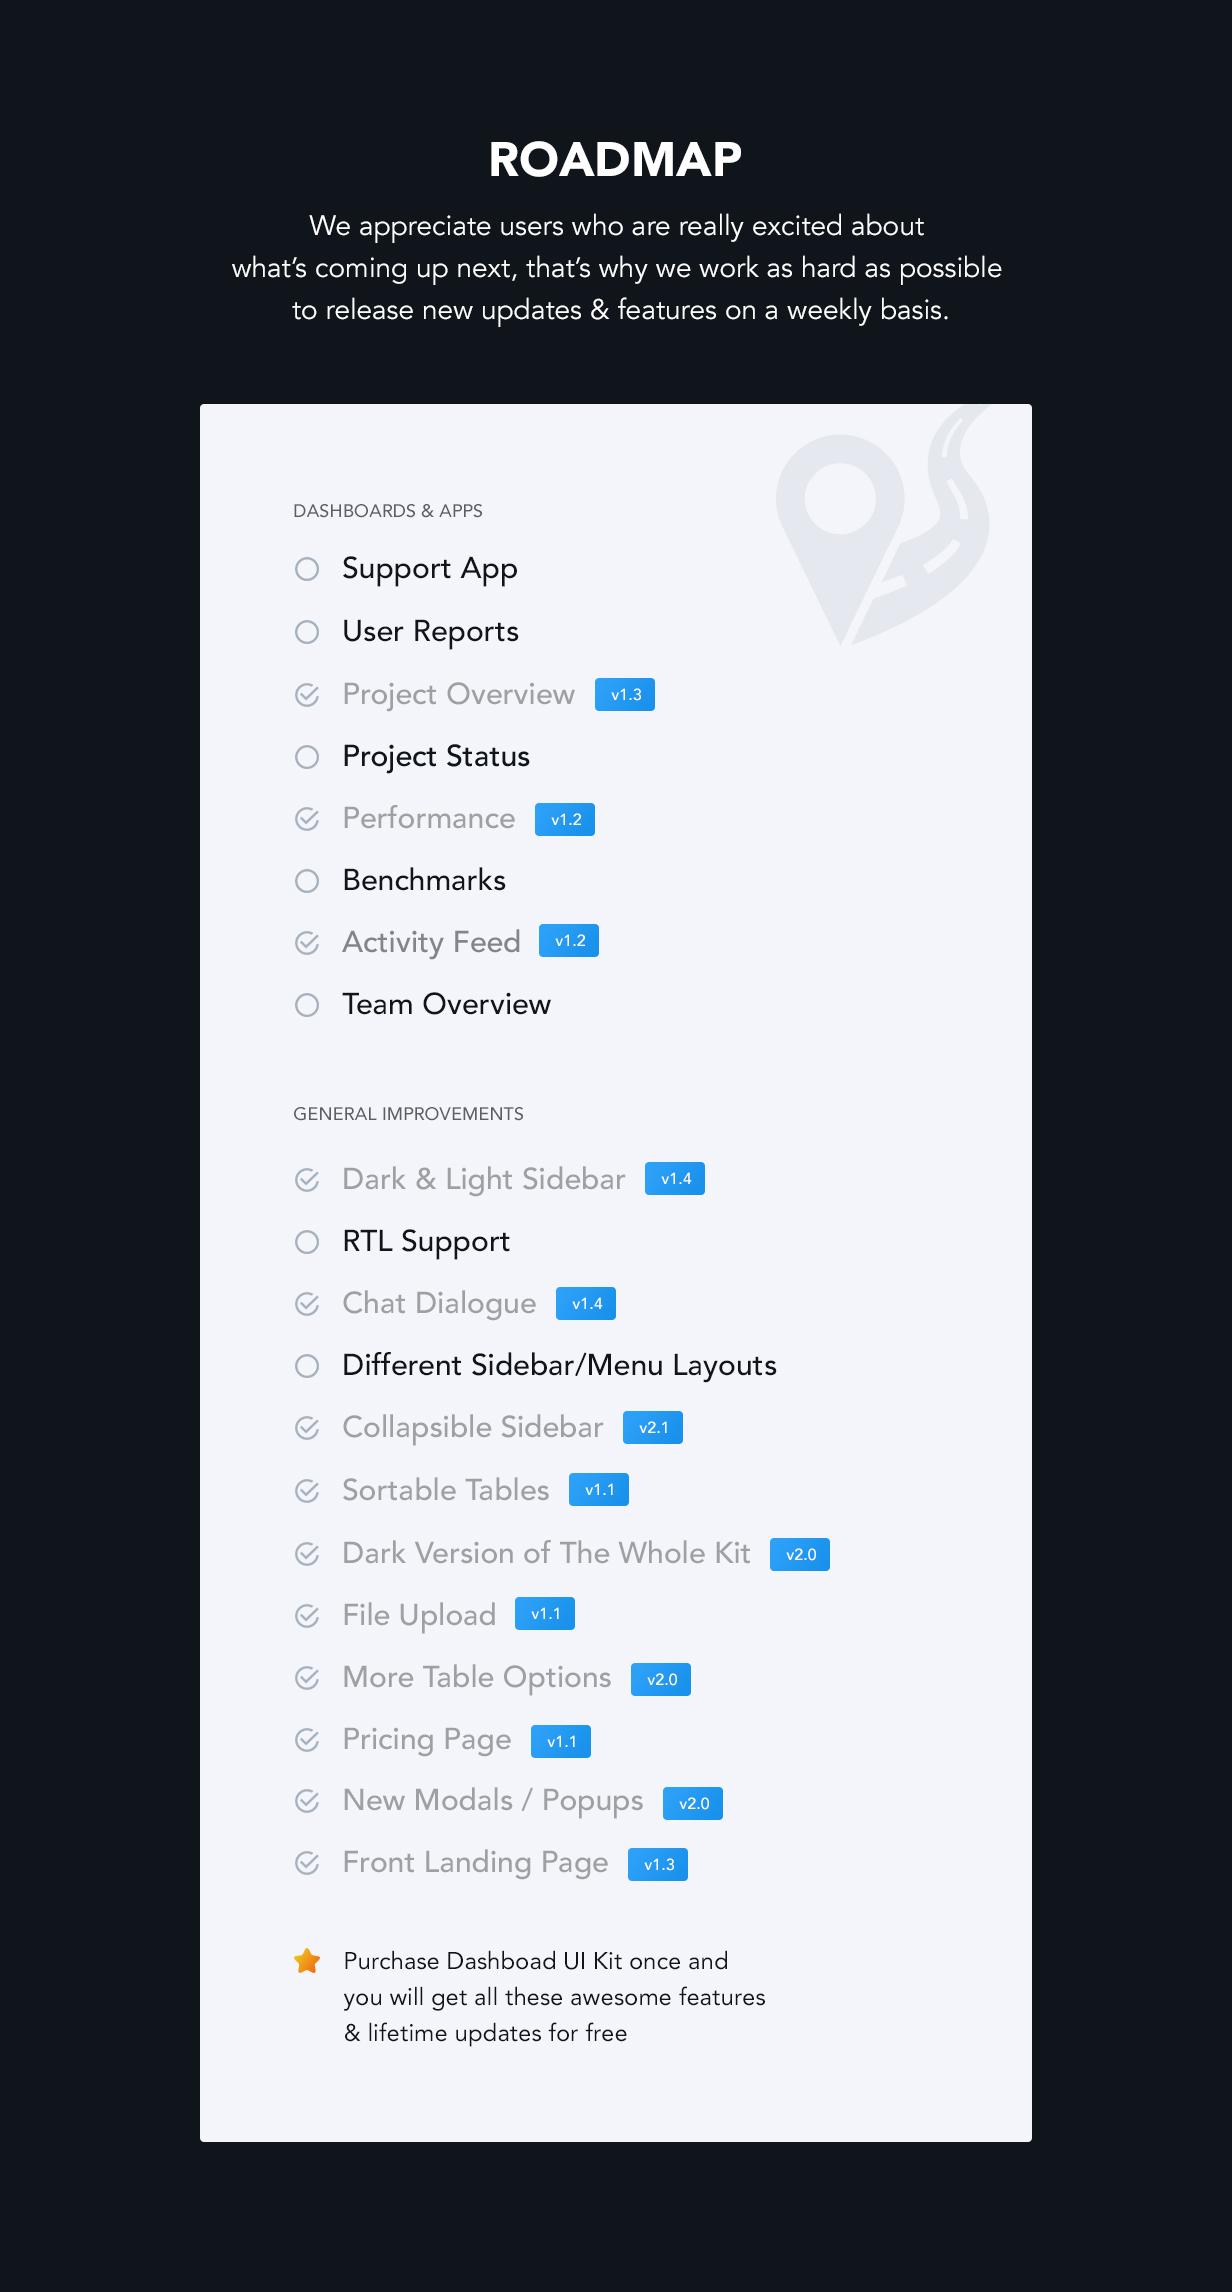 roadmap2 - Dashboard UI Kit | Admin Dashboard Template & Web Application Framework